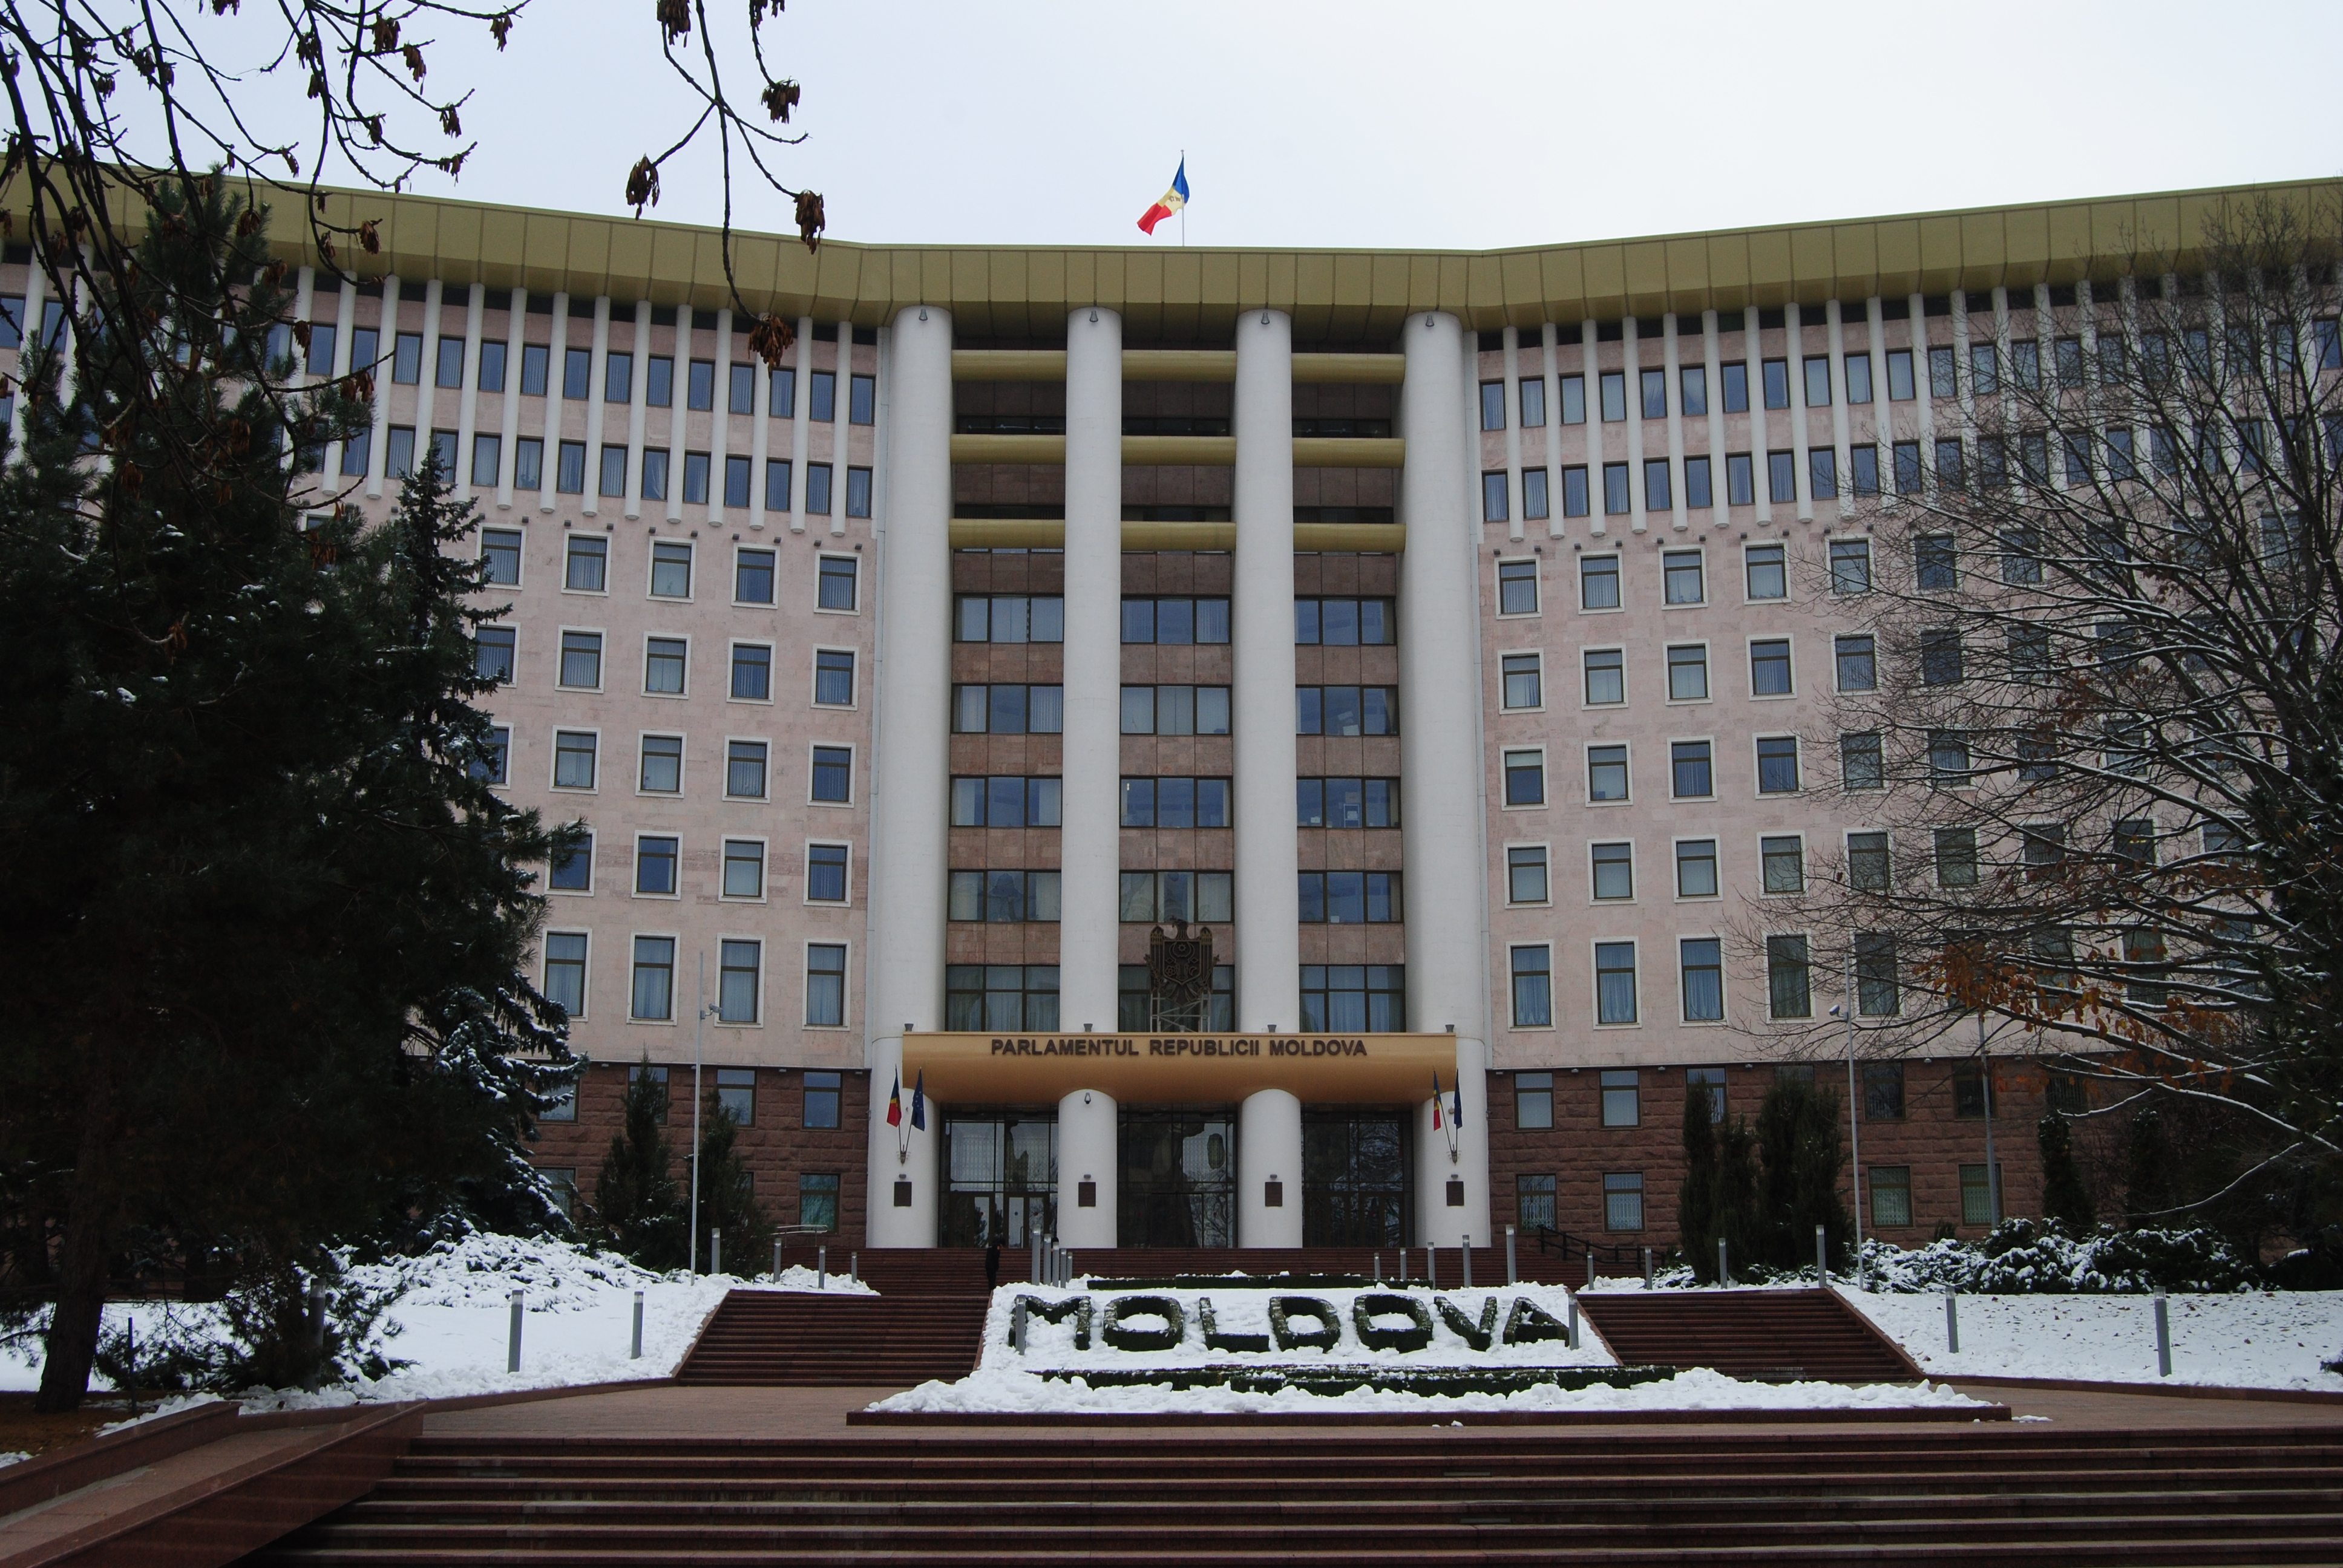 Parlamento de Moldavia entre la nieve